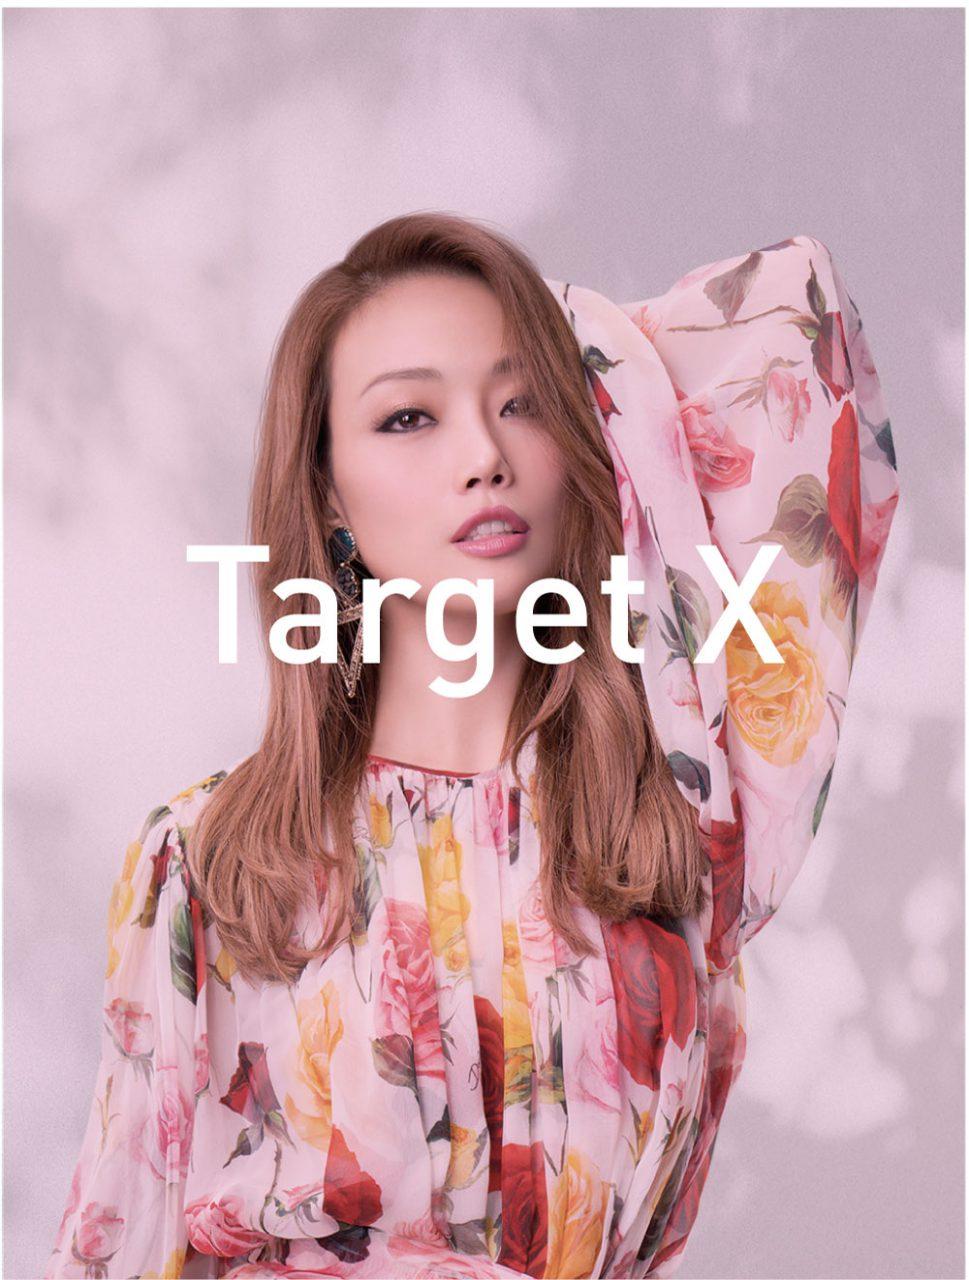 Target-X 毛孔槍療程